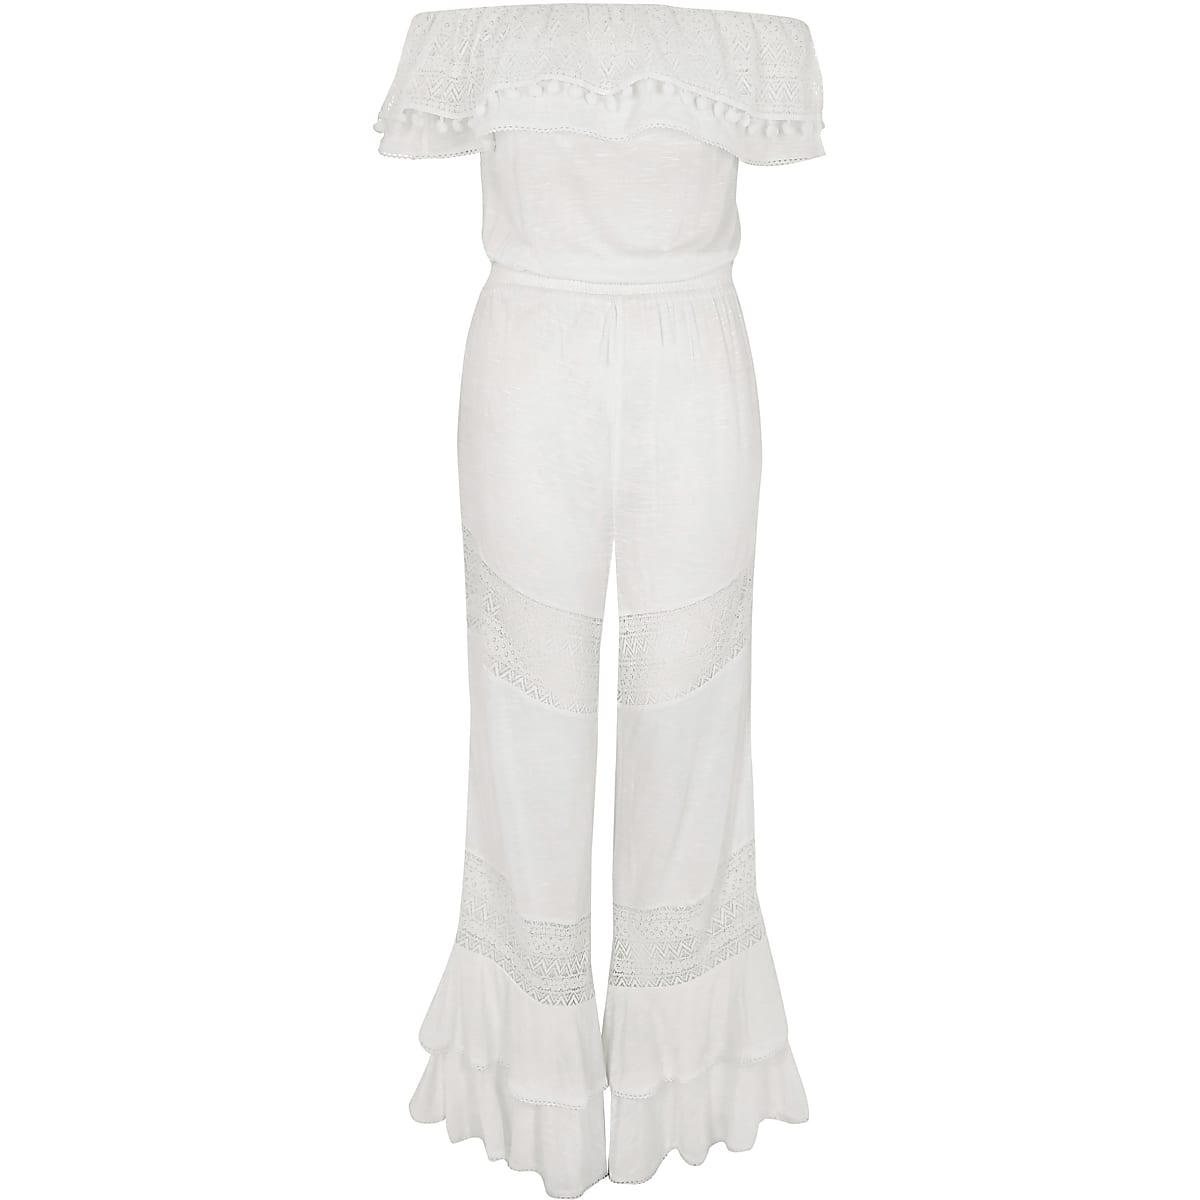 f675243d7b White jersey bardot frill jumpsuit - Kaftans & Beach Cover-Ups ...